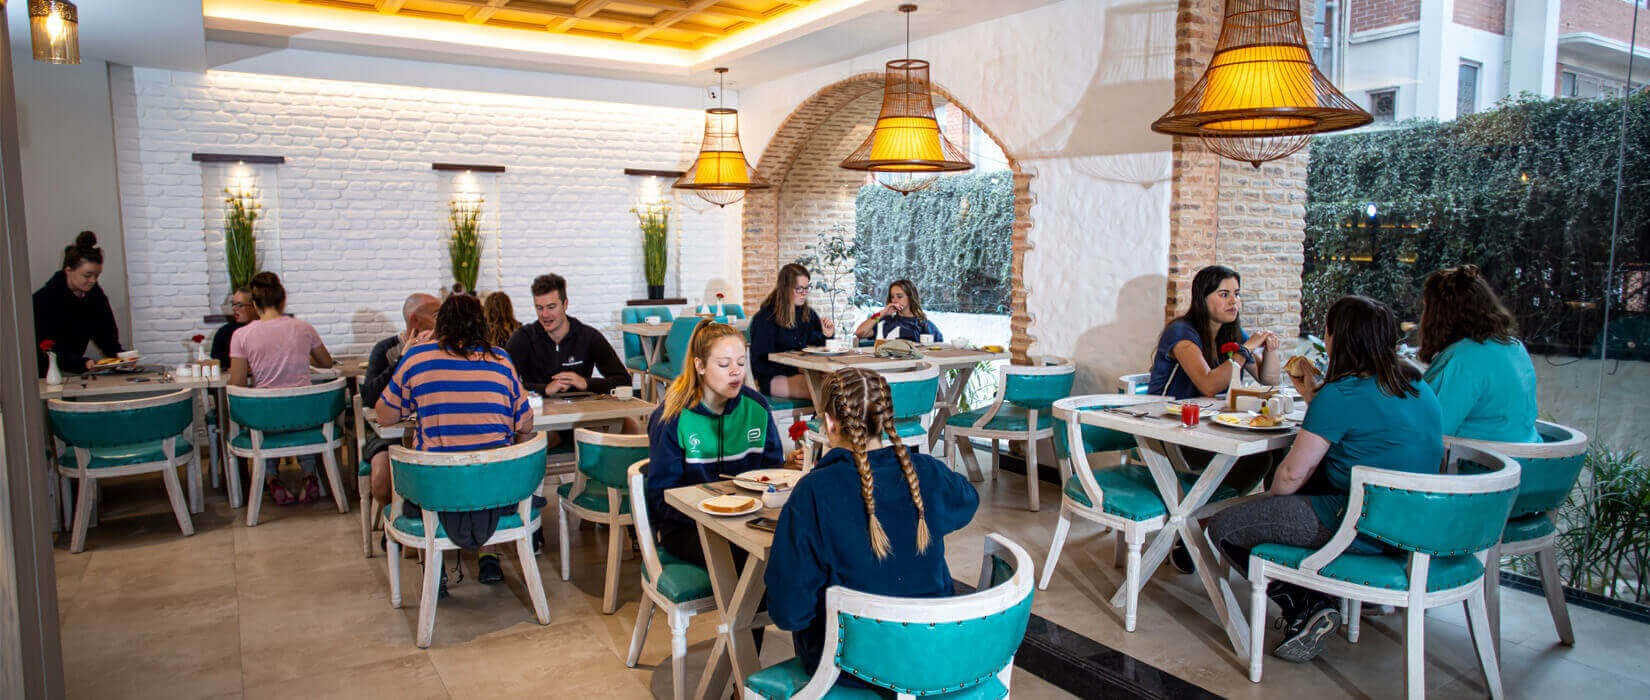 Atithi Dine and Coffee Shop